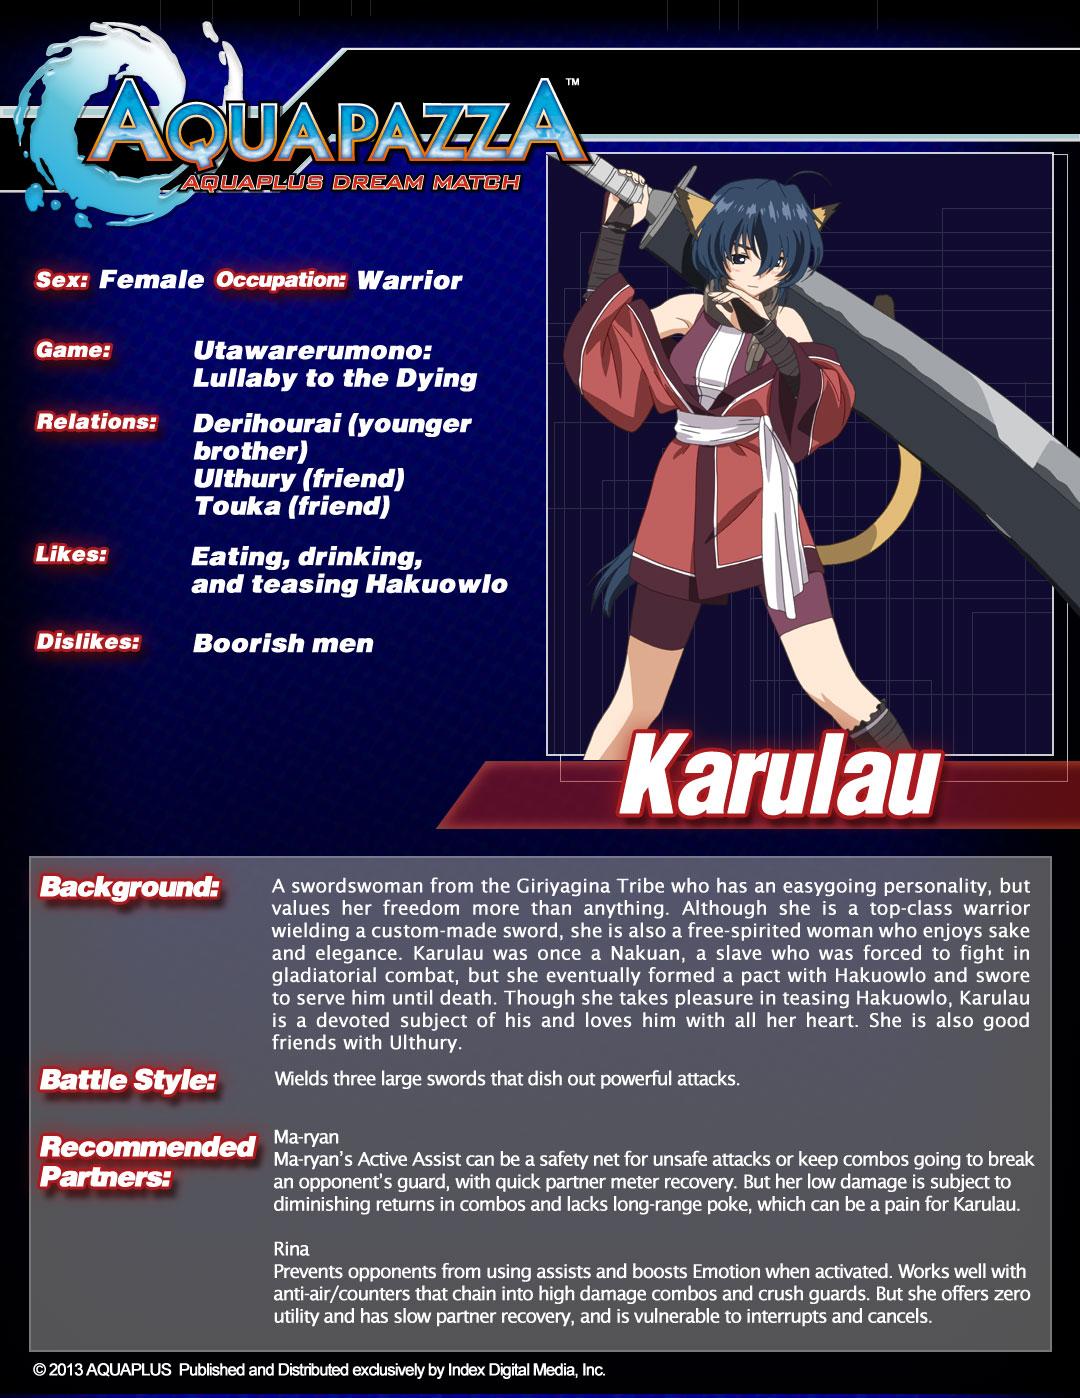 Aquapazza-Char-sheet-Karulau